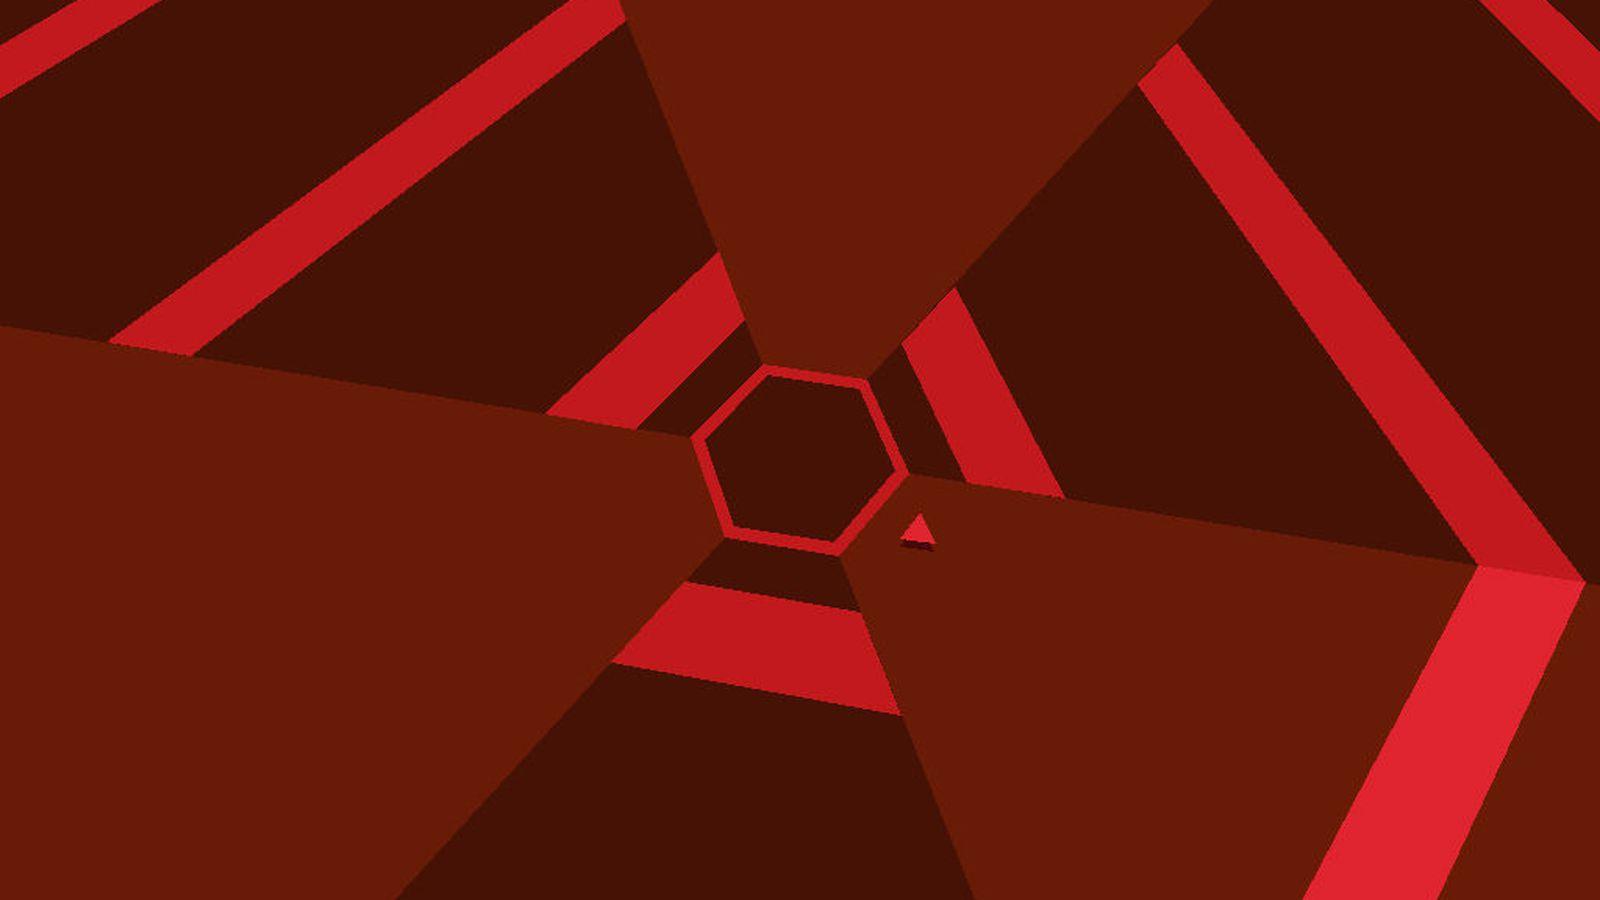 hexagon terry cavanagh games - HD1200×800